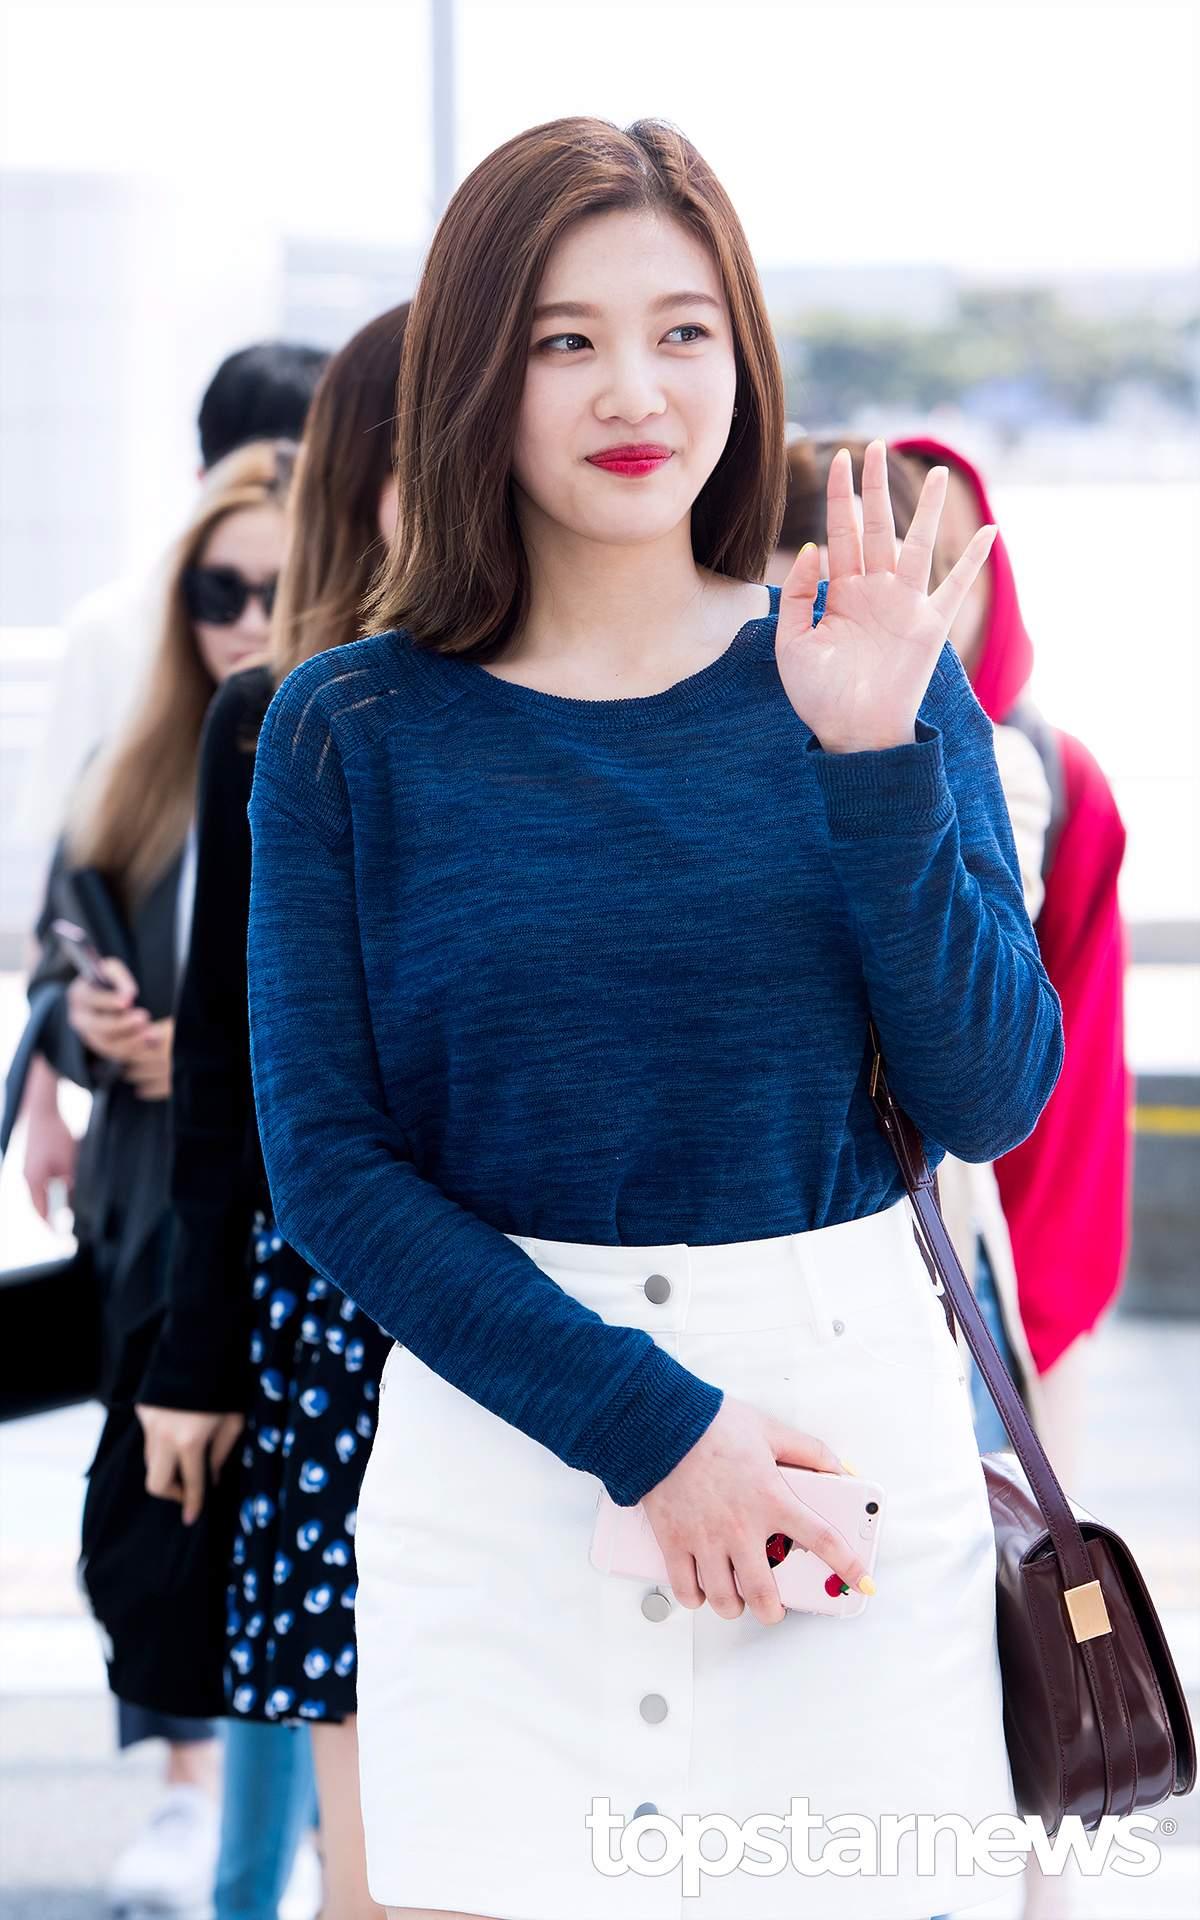 Red Velvet - Joy 出道至今身材一直是話題,不過最近瘦身成功終於讓壞心網友閉嘴了!